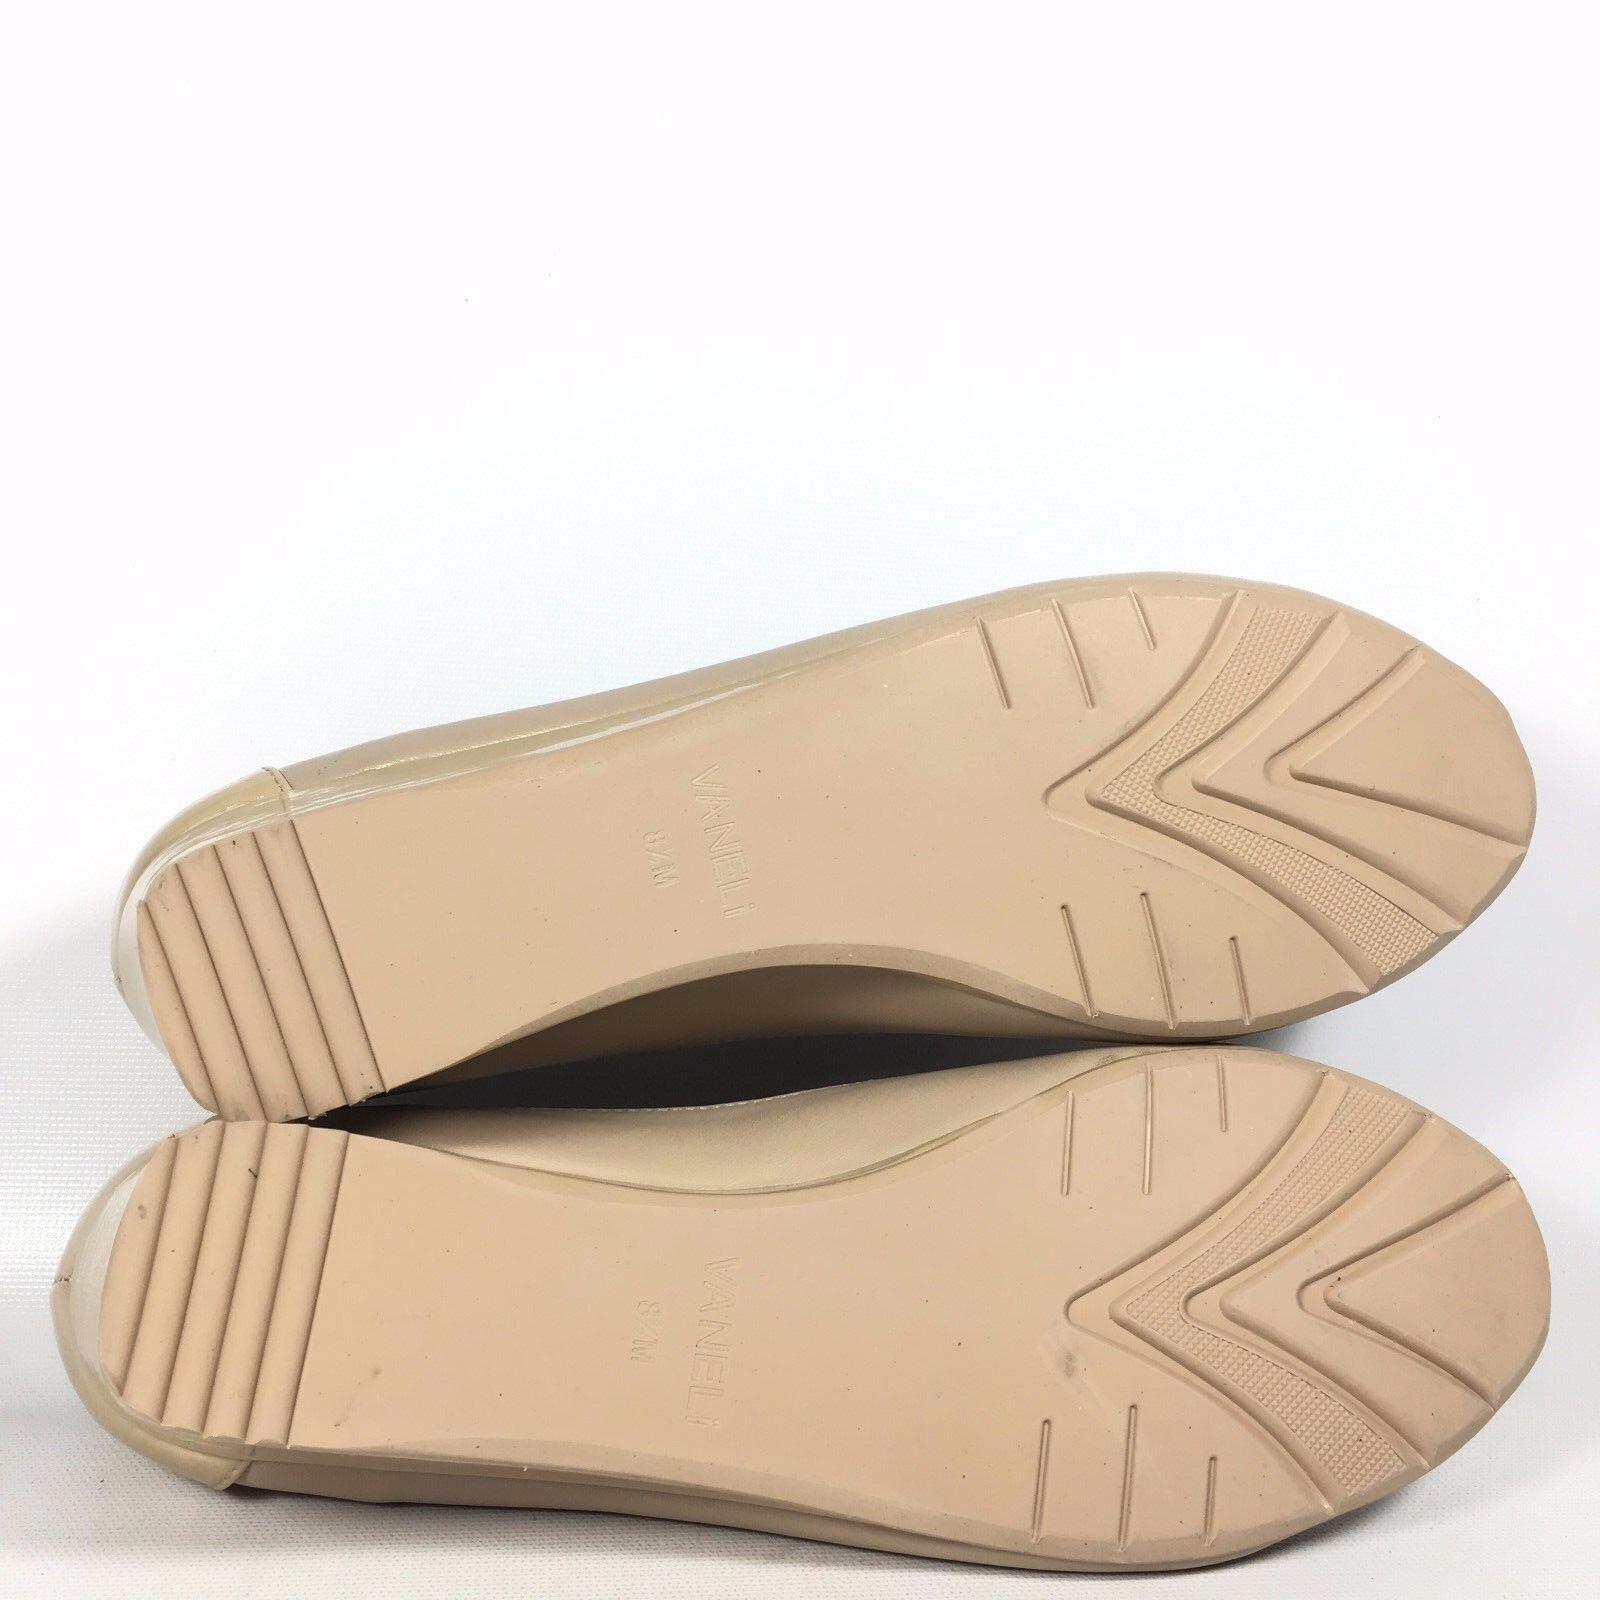 VANELi Purple Collection Valeka Damenschuhe Beige Patent Mesh Peep Toe Sandale Wedge